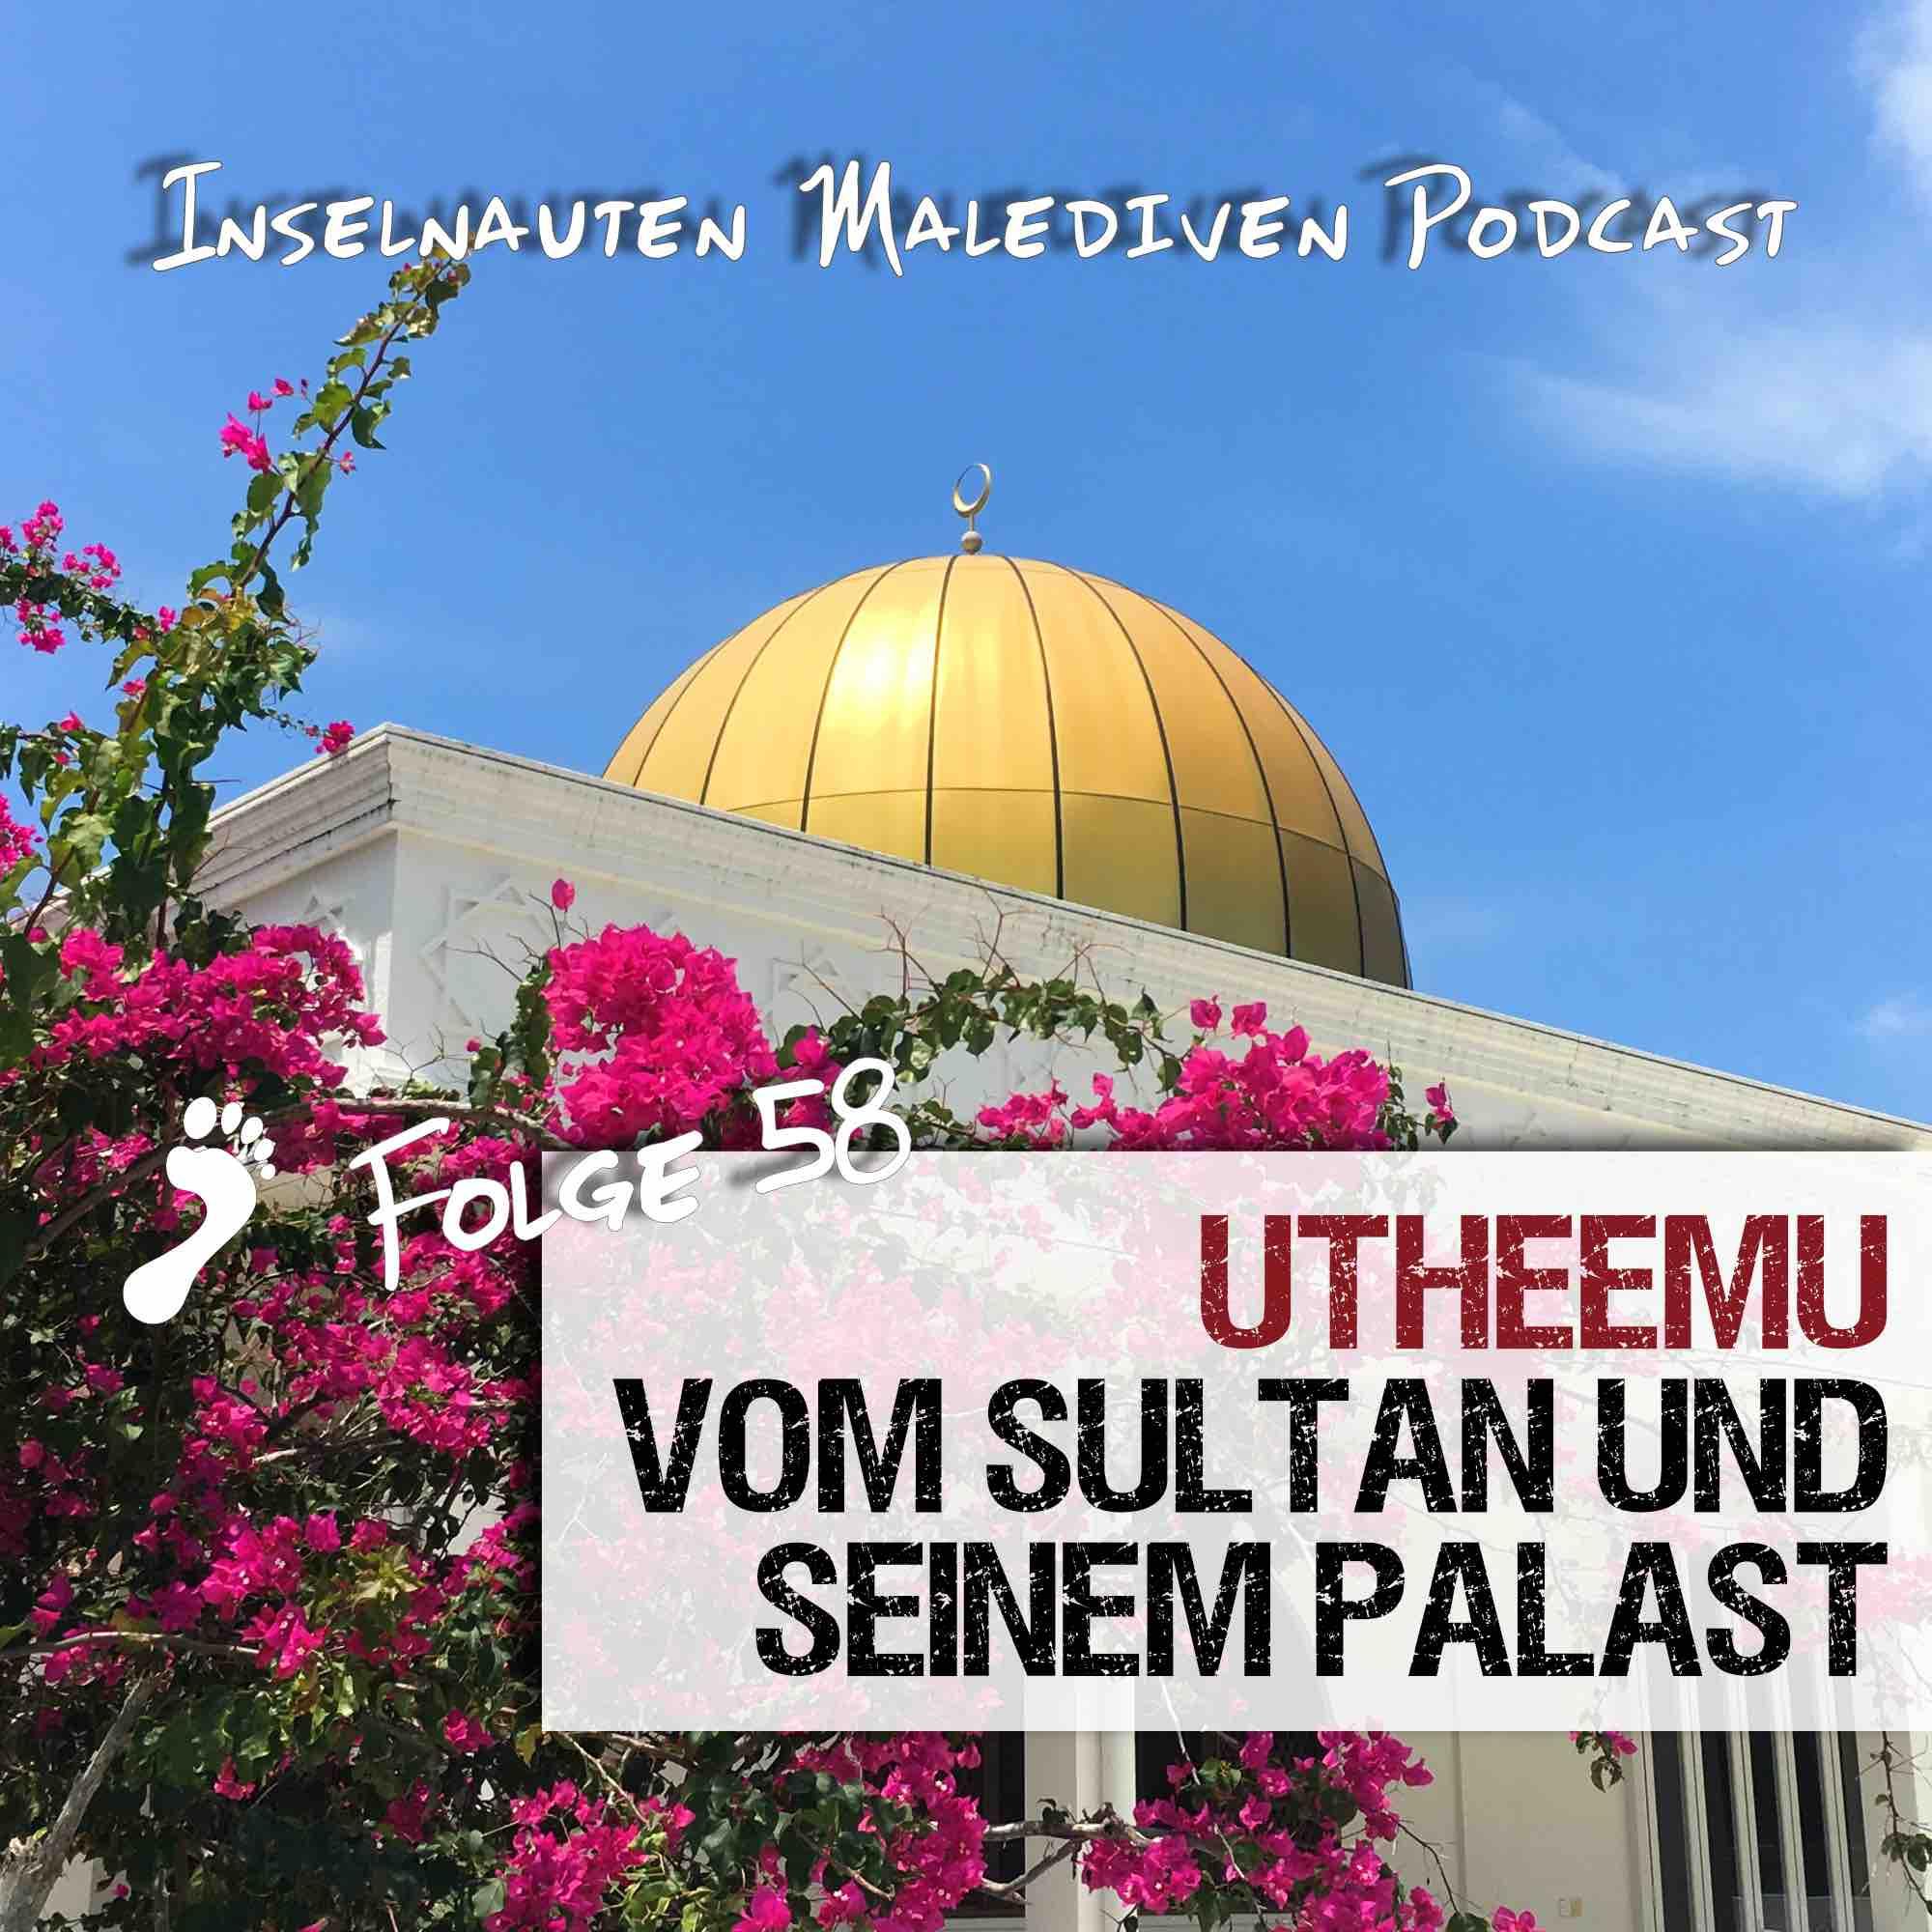 Malediven Utheemu Reisebericht